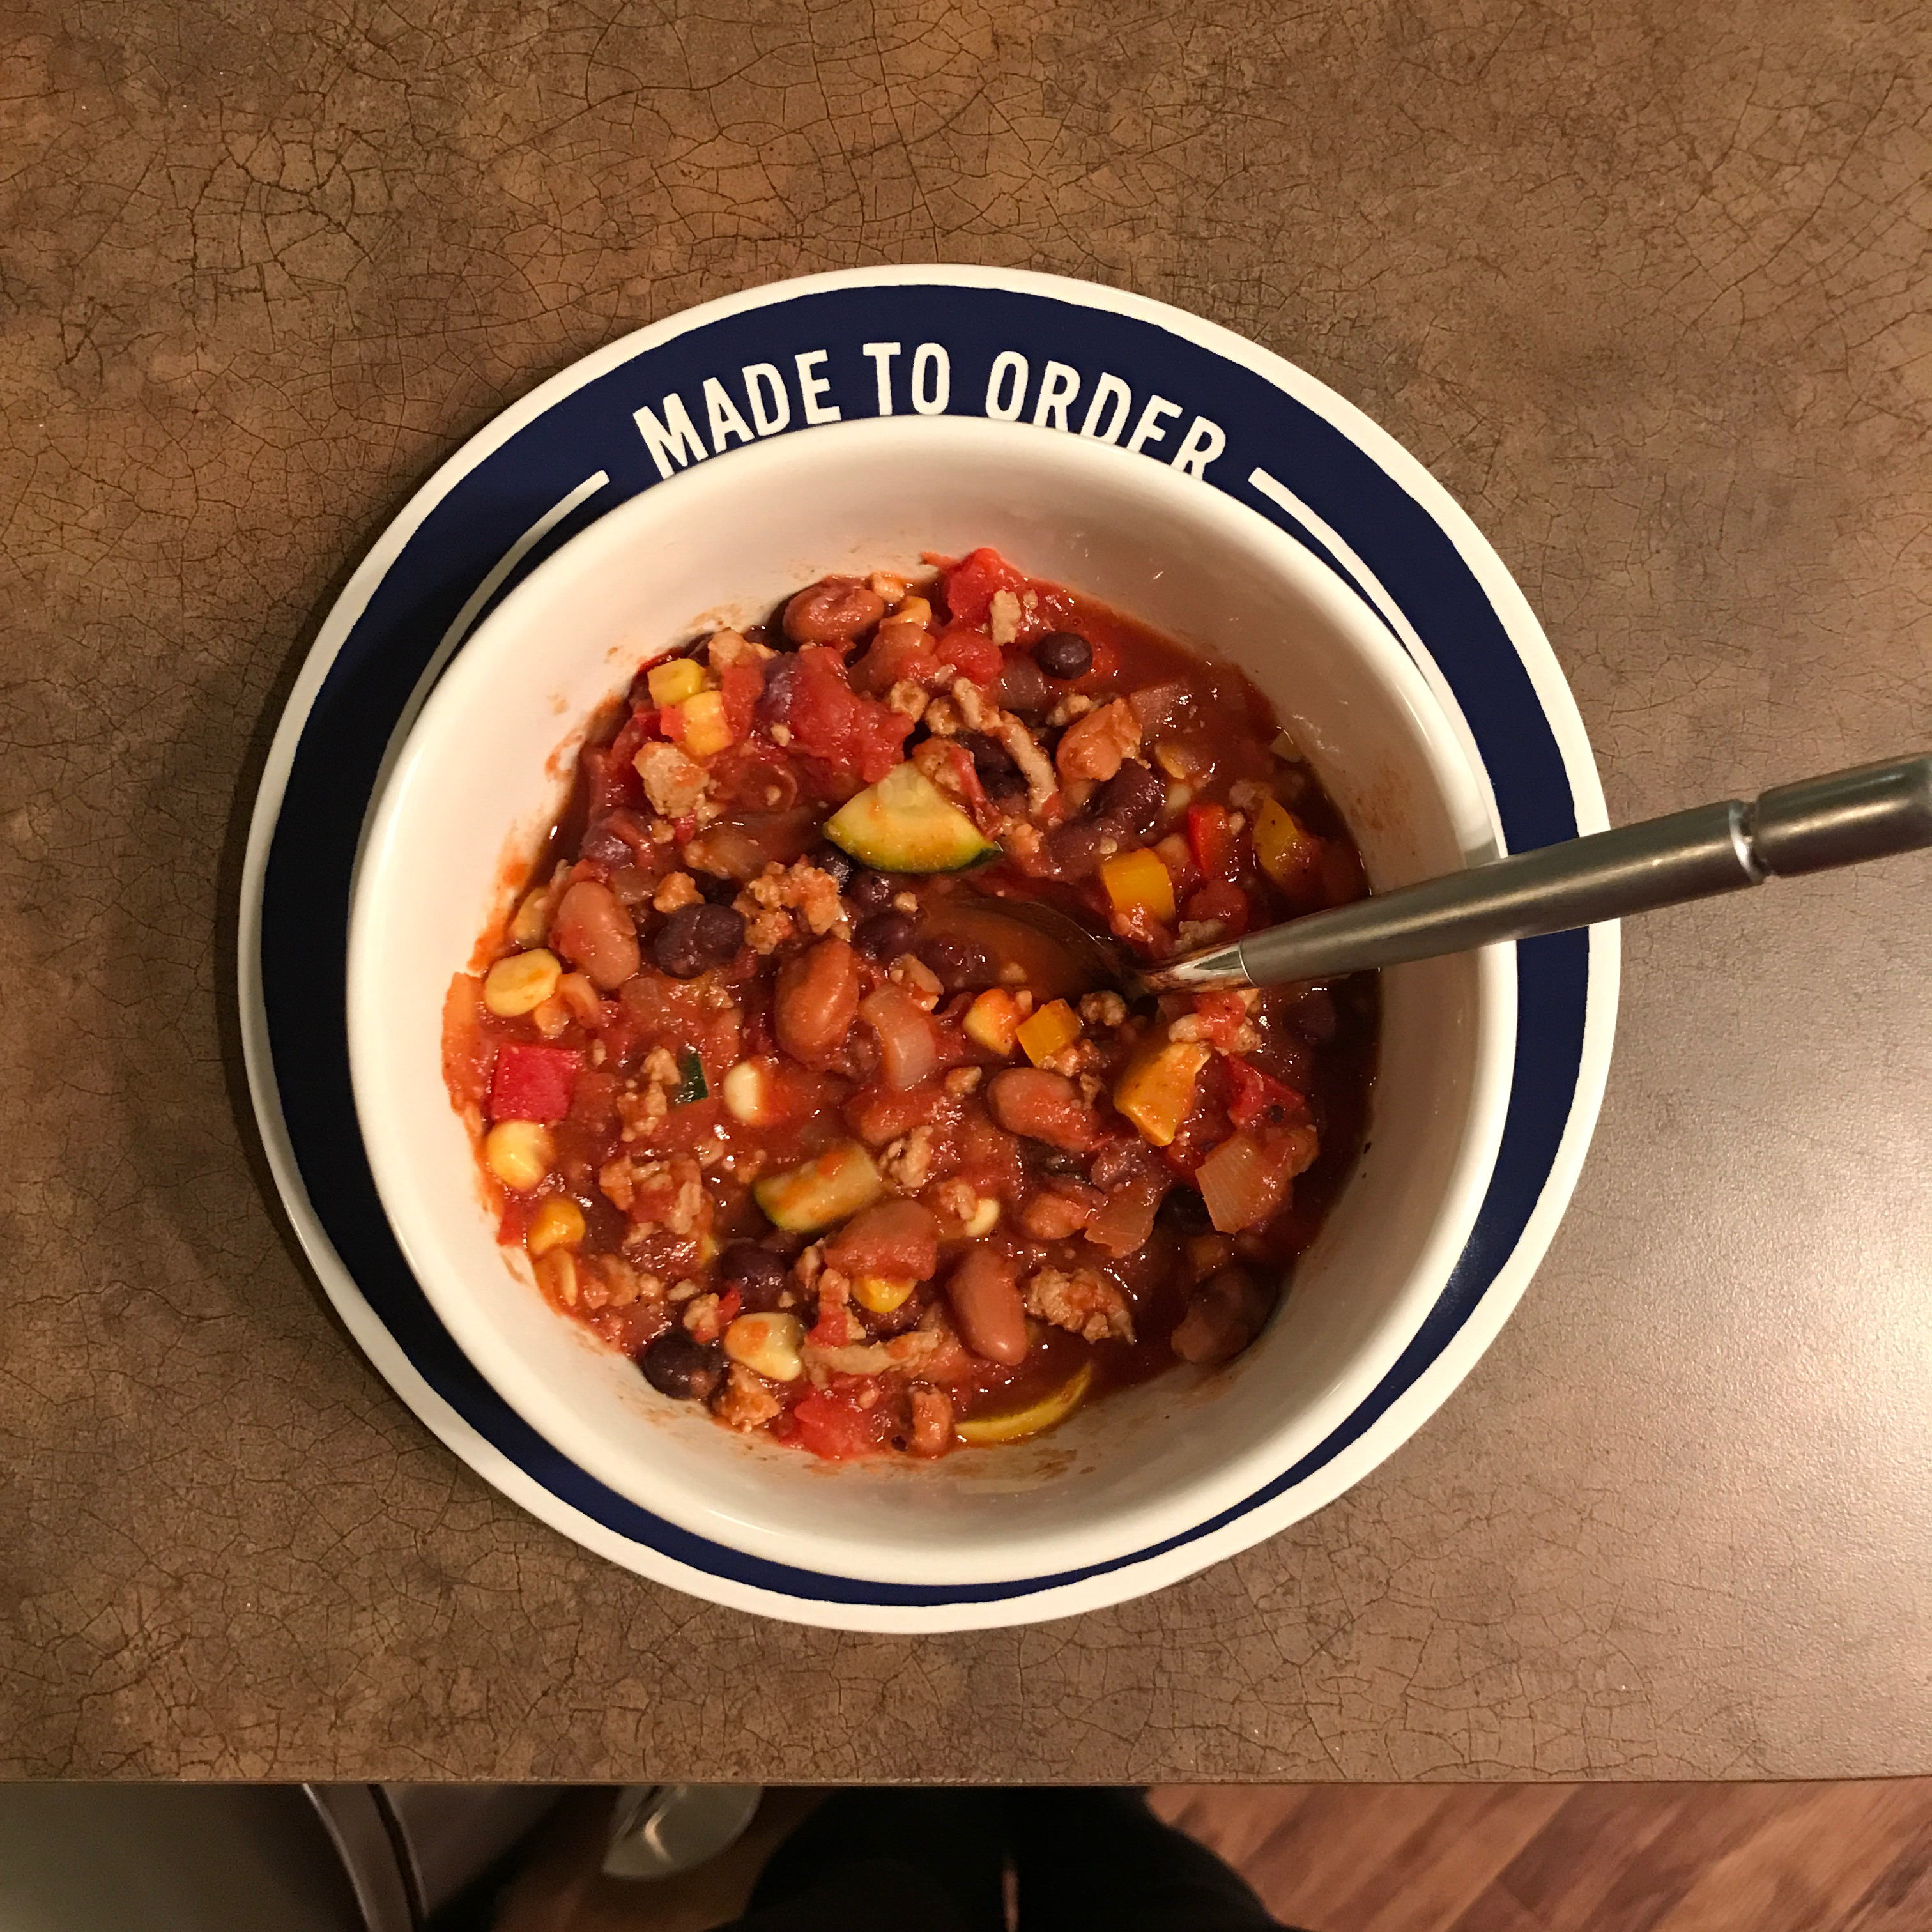 Very Veggie and Beef Chili safiya2@gmail.com